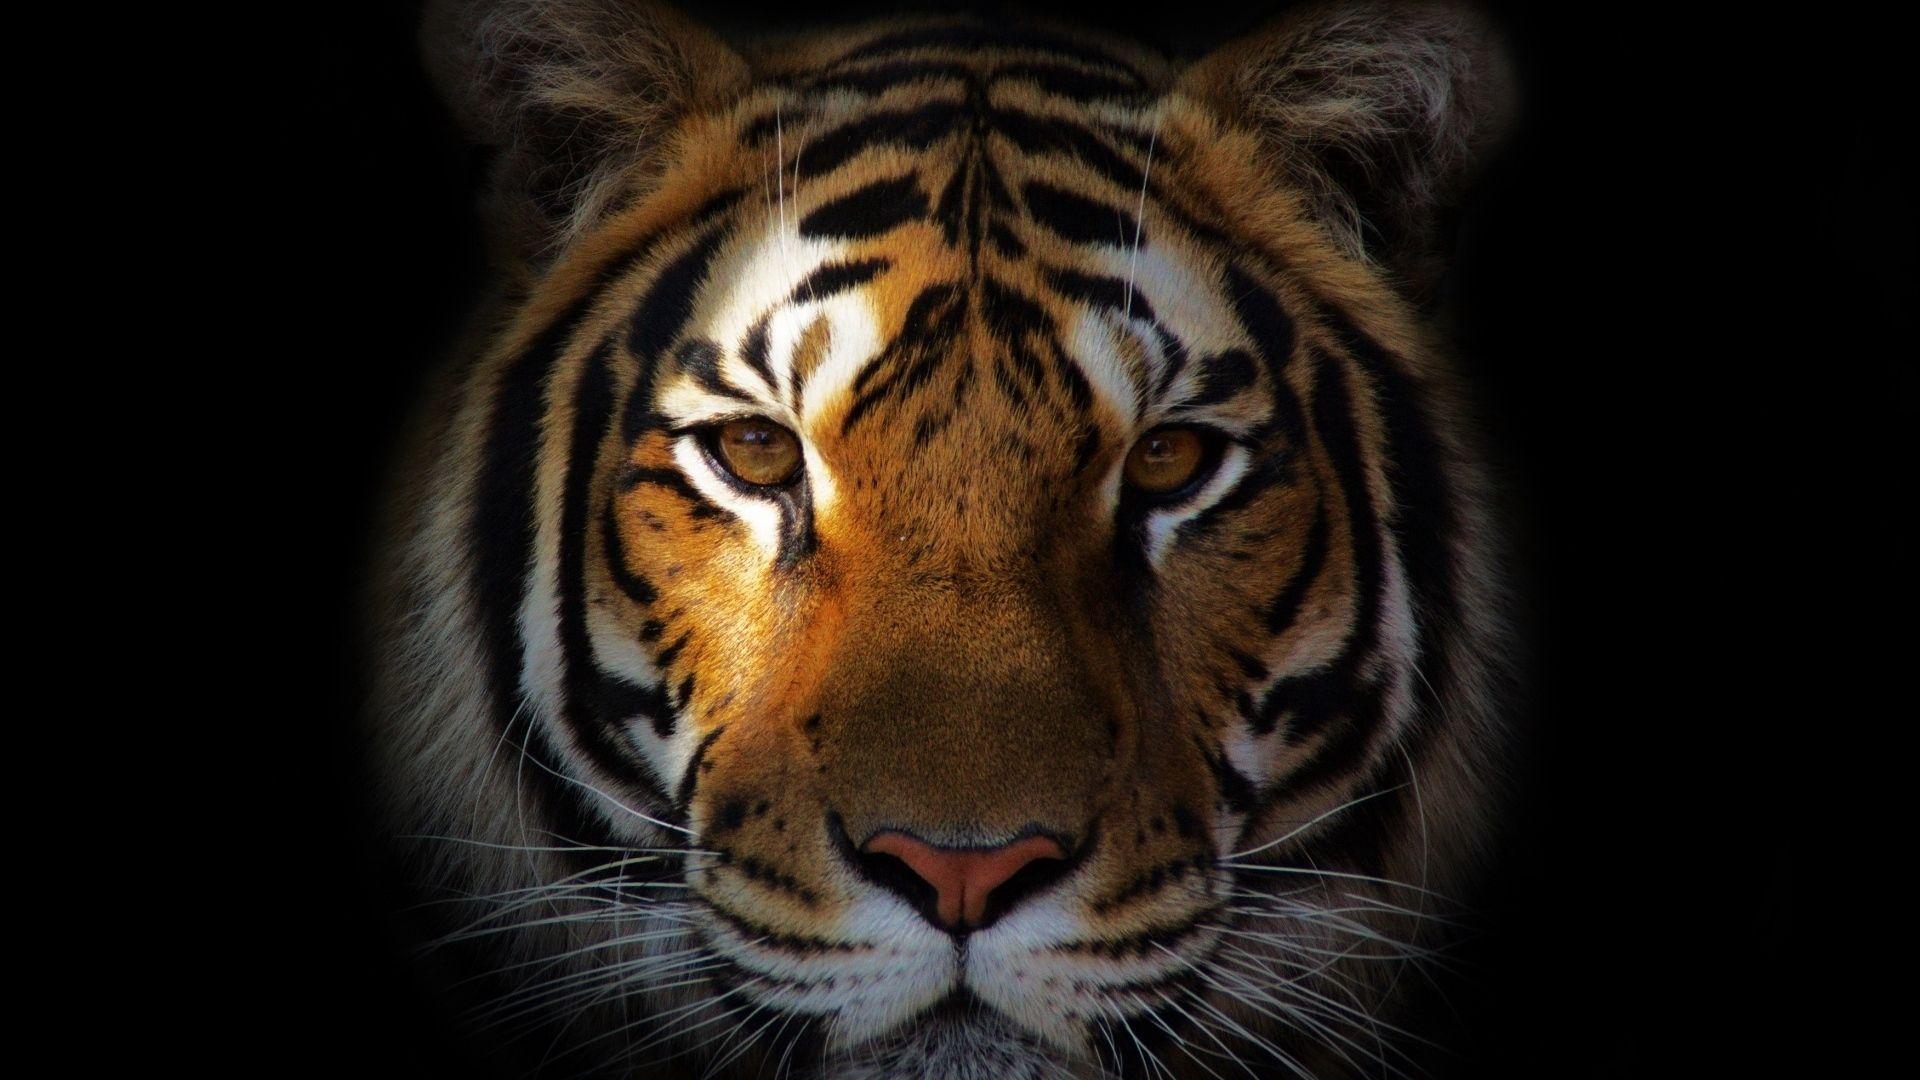 Tiger, PC Wallpaper HD